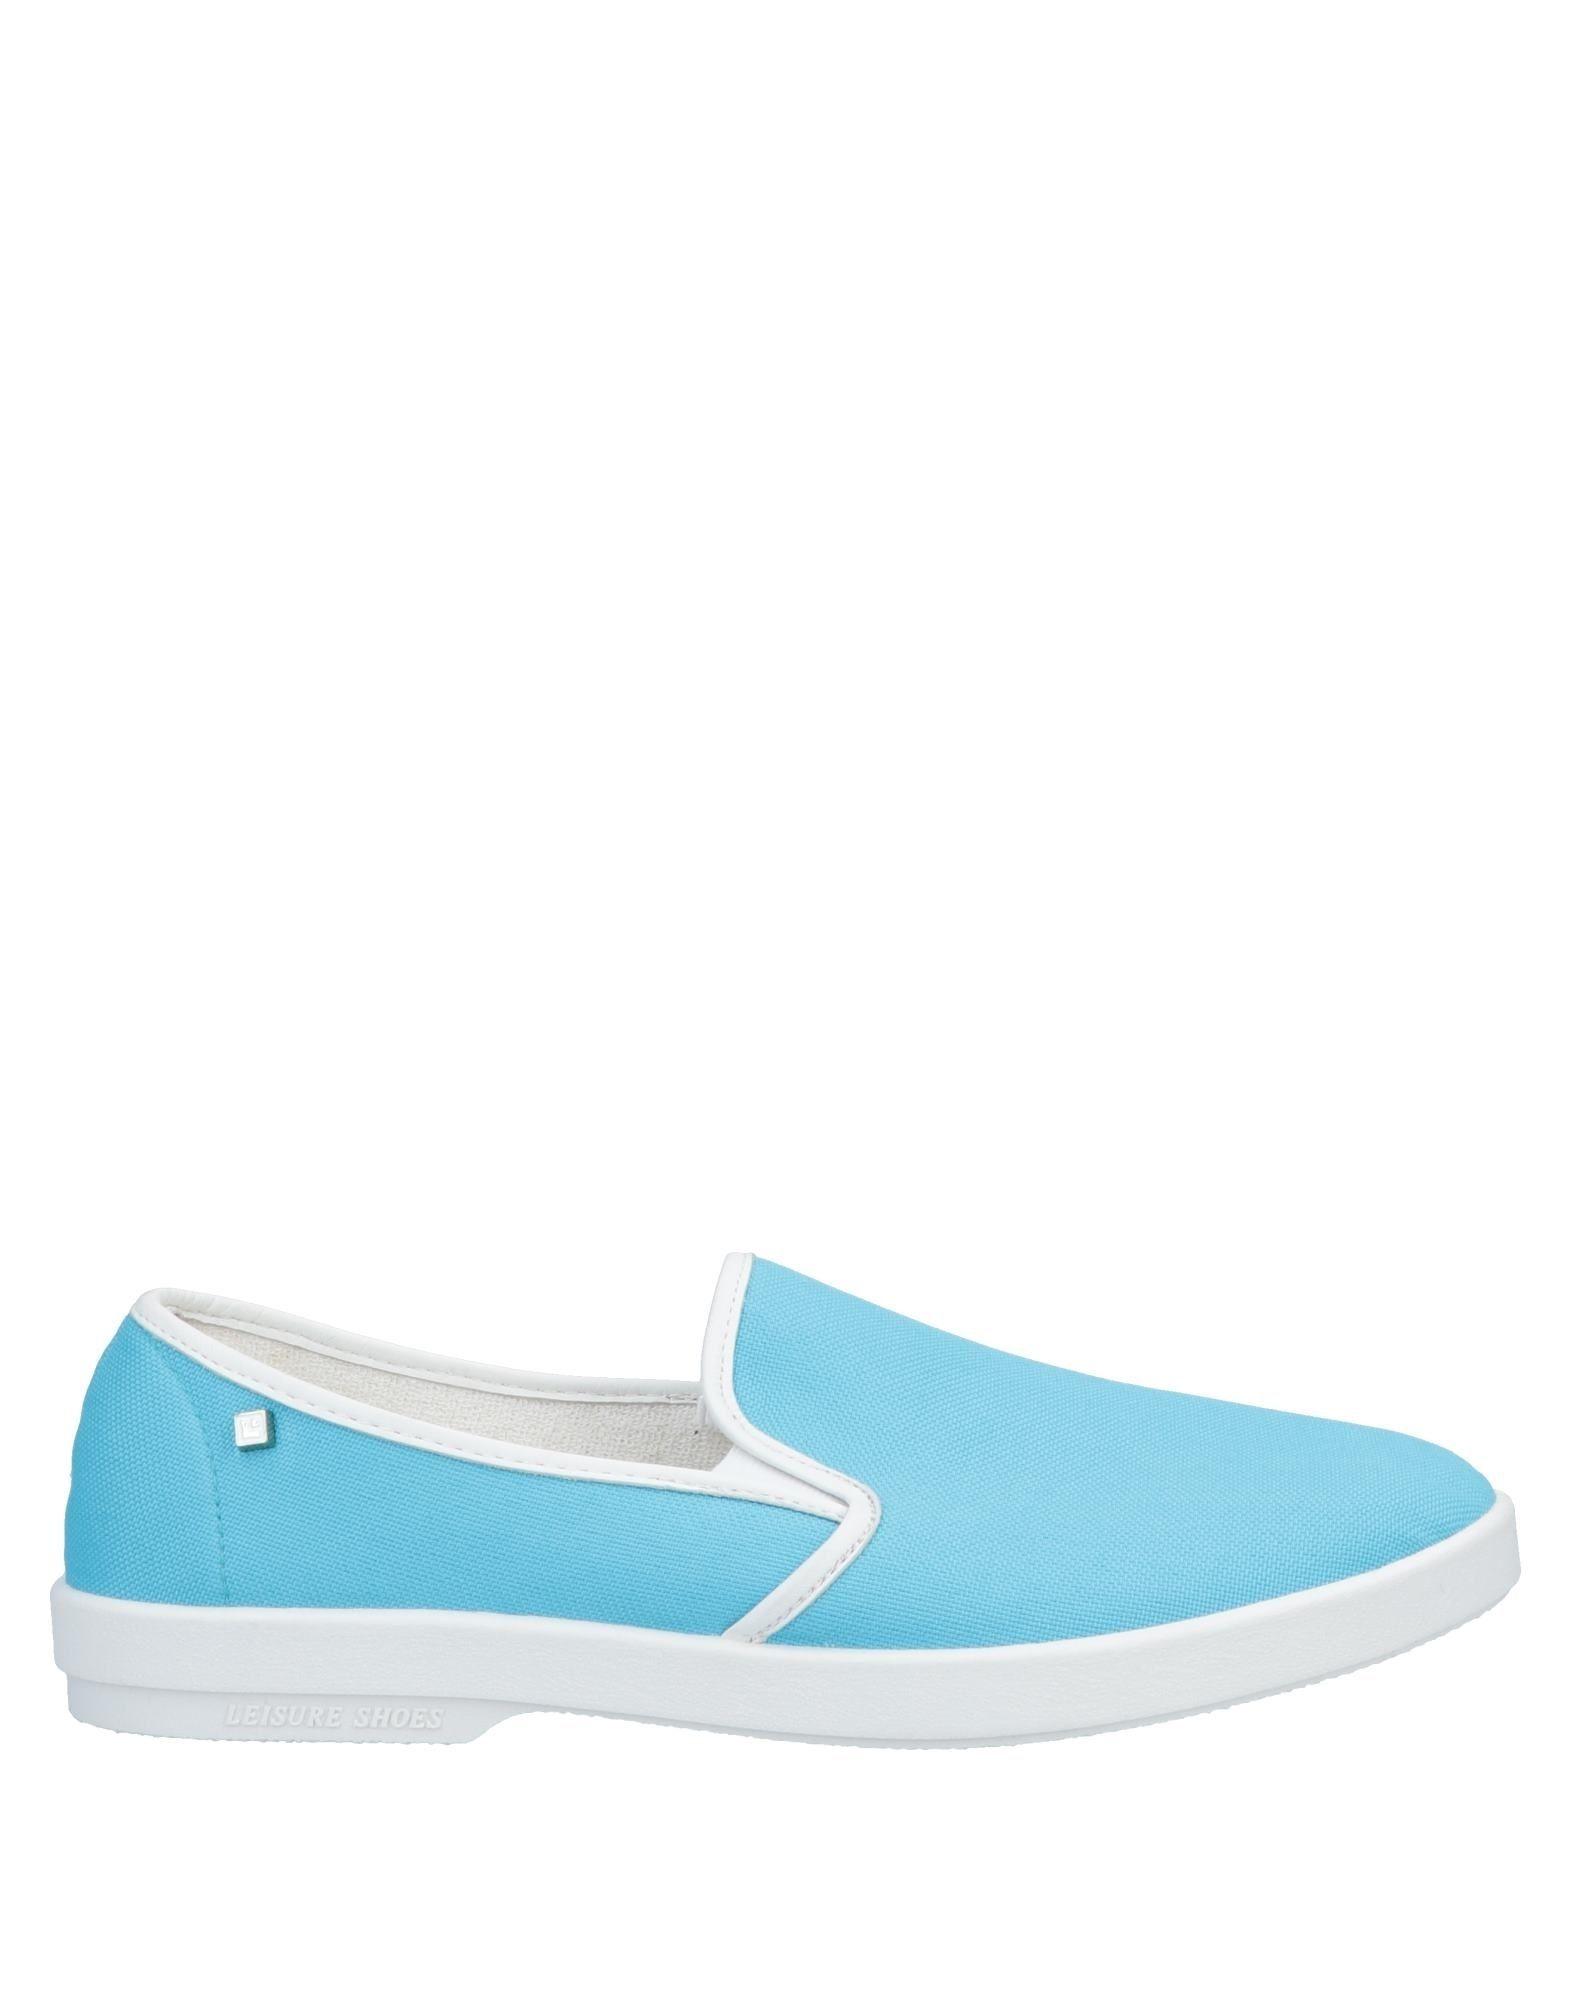 brand new 23ca5 c65dc RIVIERAS SNEAKERS. #rivieras #shoes | Rivieras | Sneakers ...